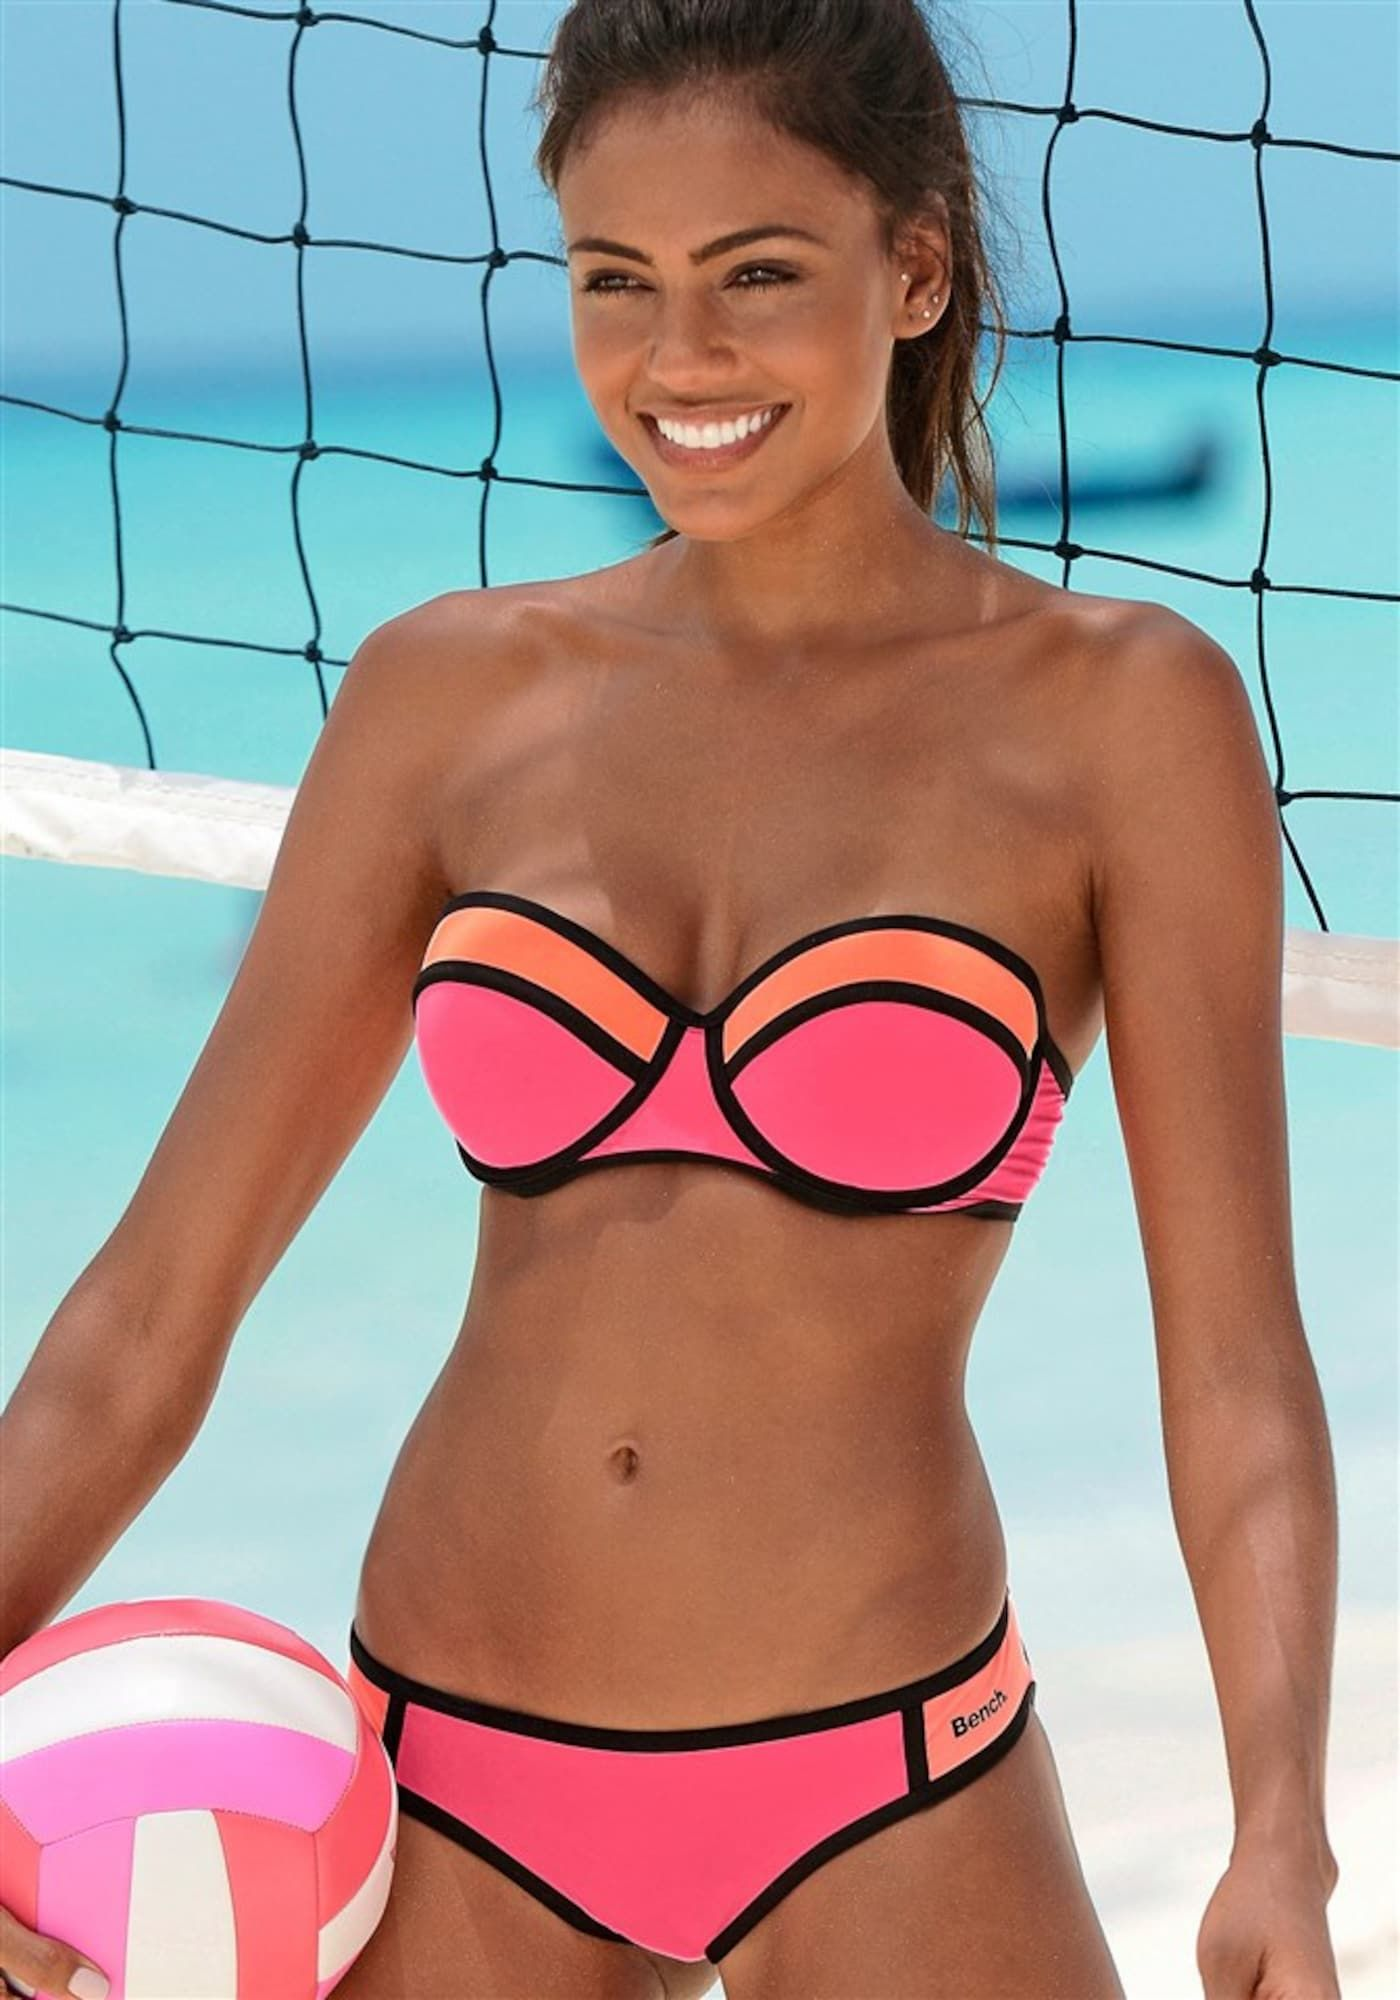 BENCH Balconette-Bikini Damen, Orange / Koralle / Pink, Größe 38 A